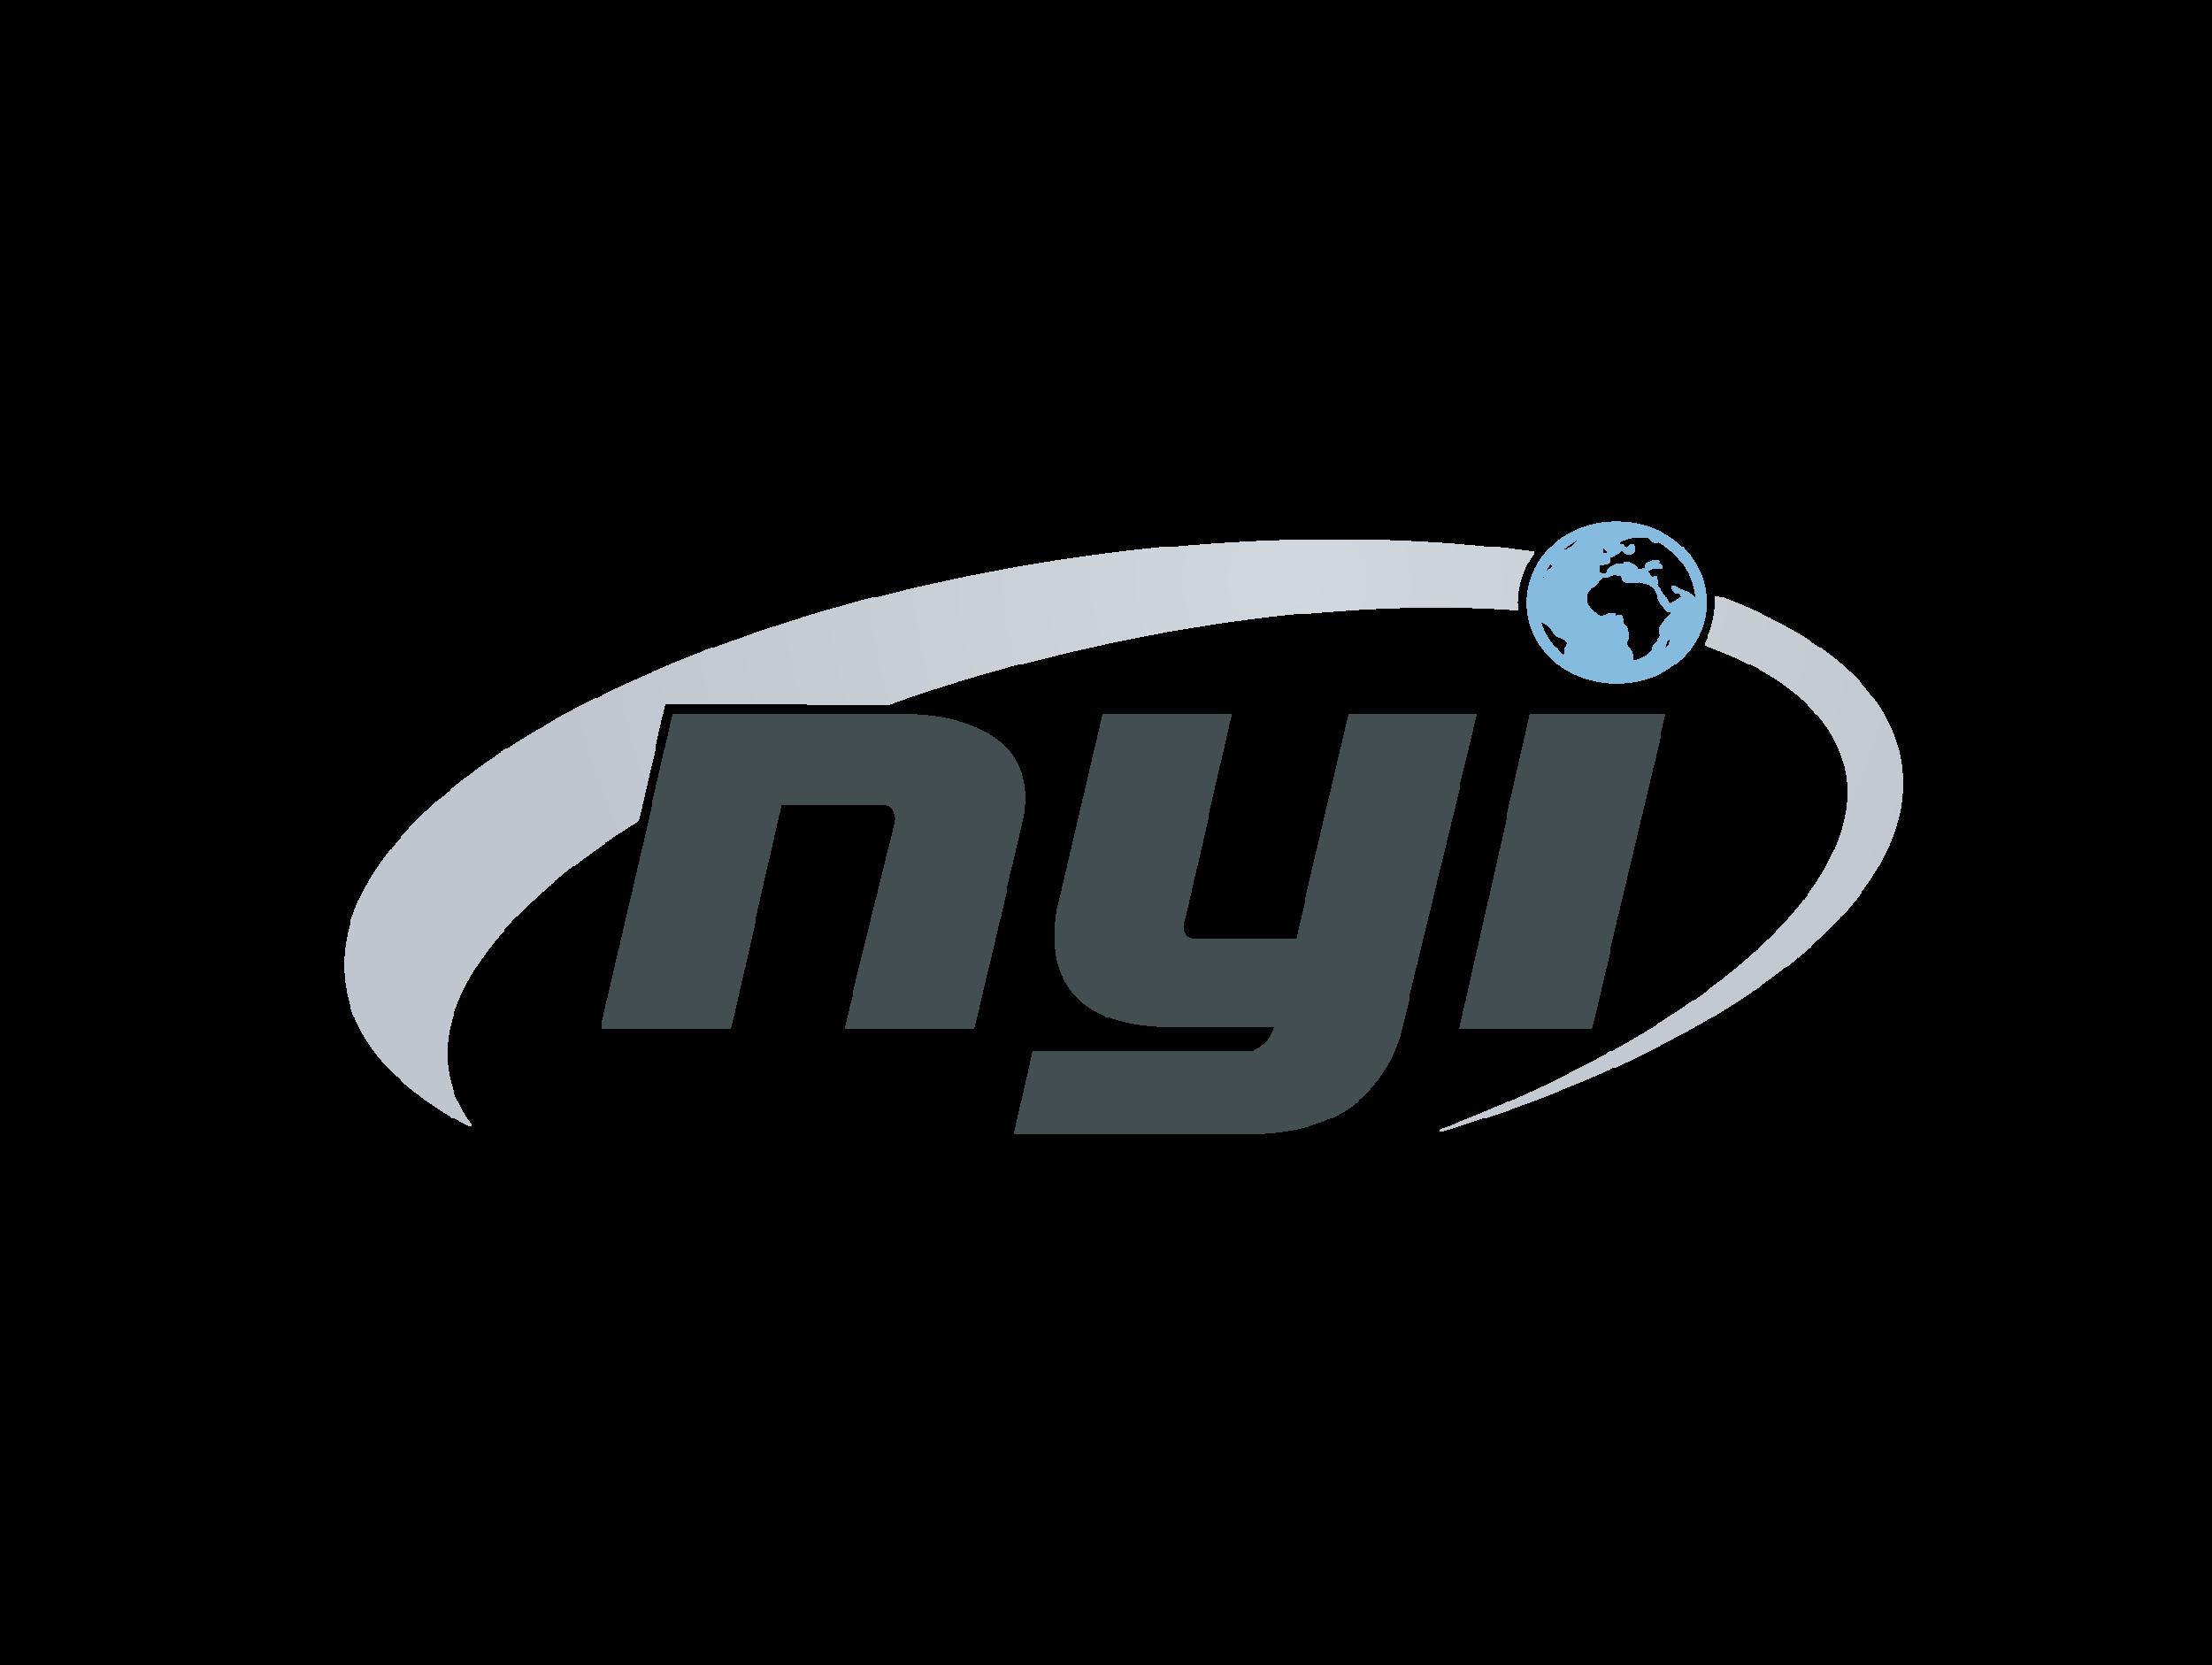 Global NYI Logo.png